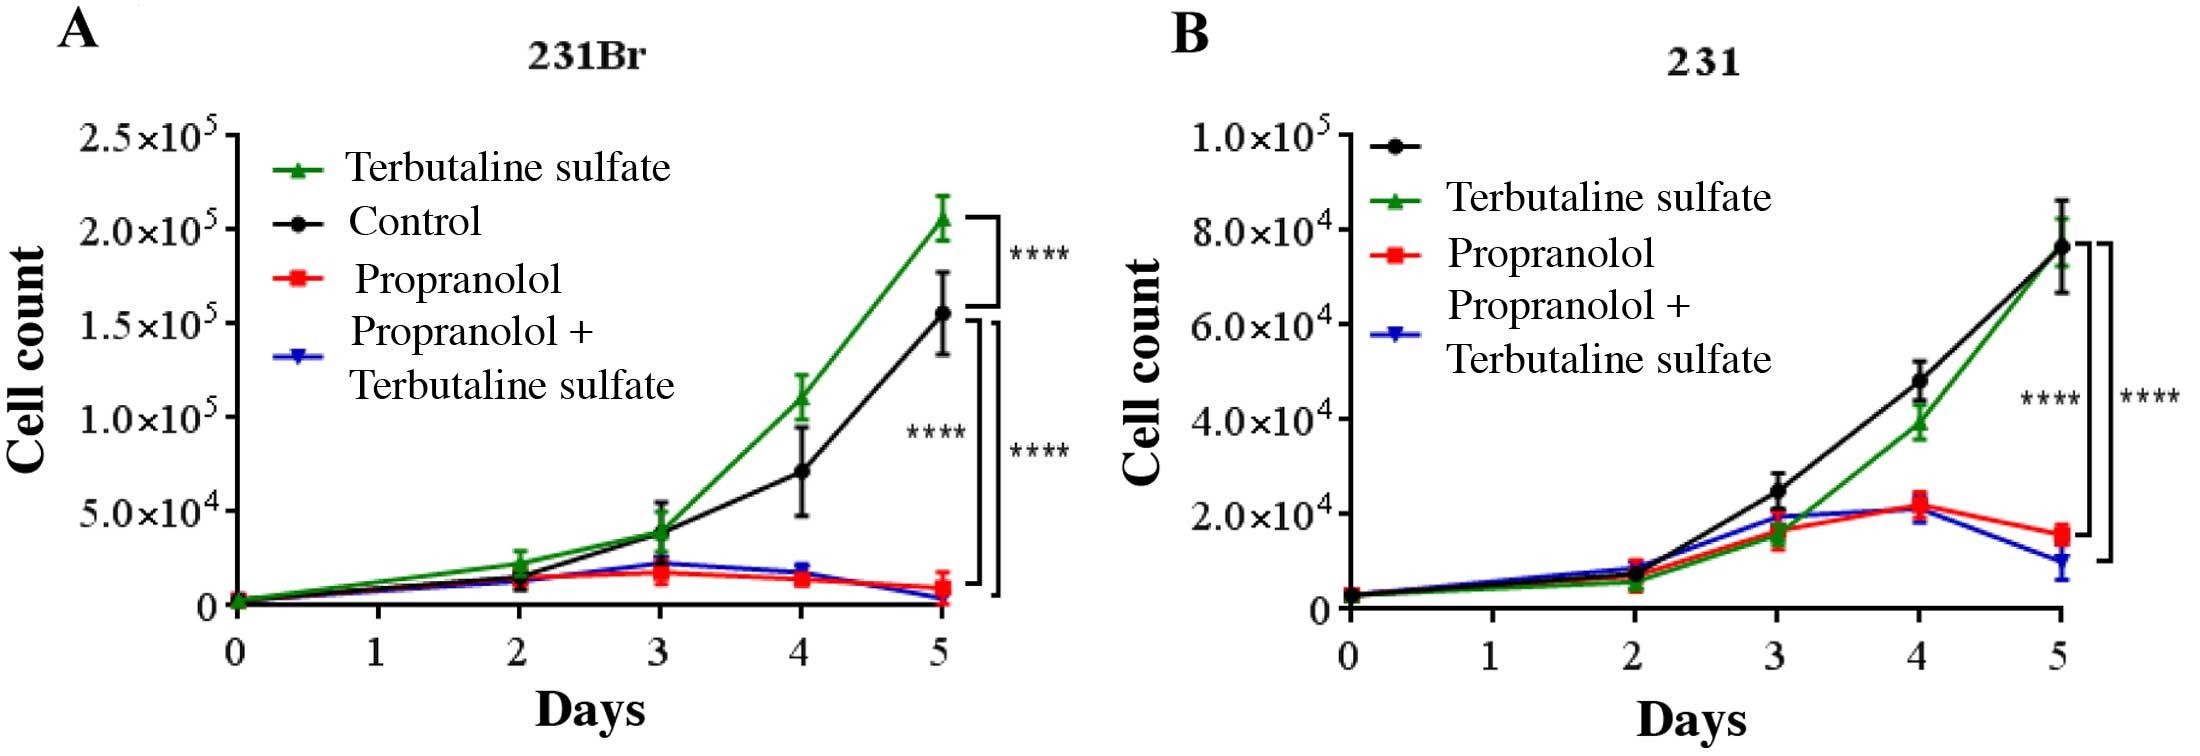 propecia minoxidil